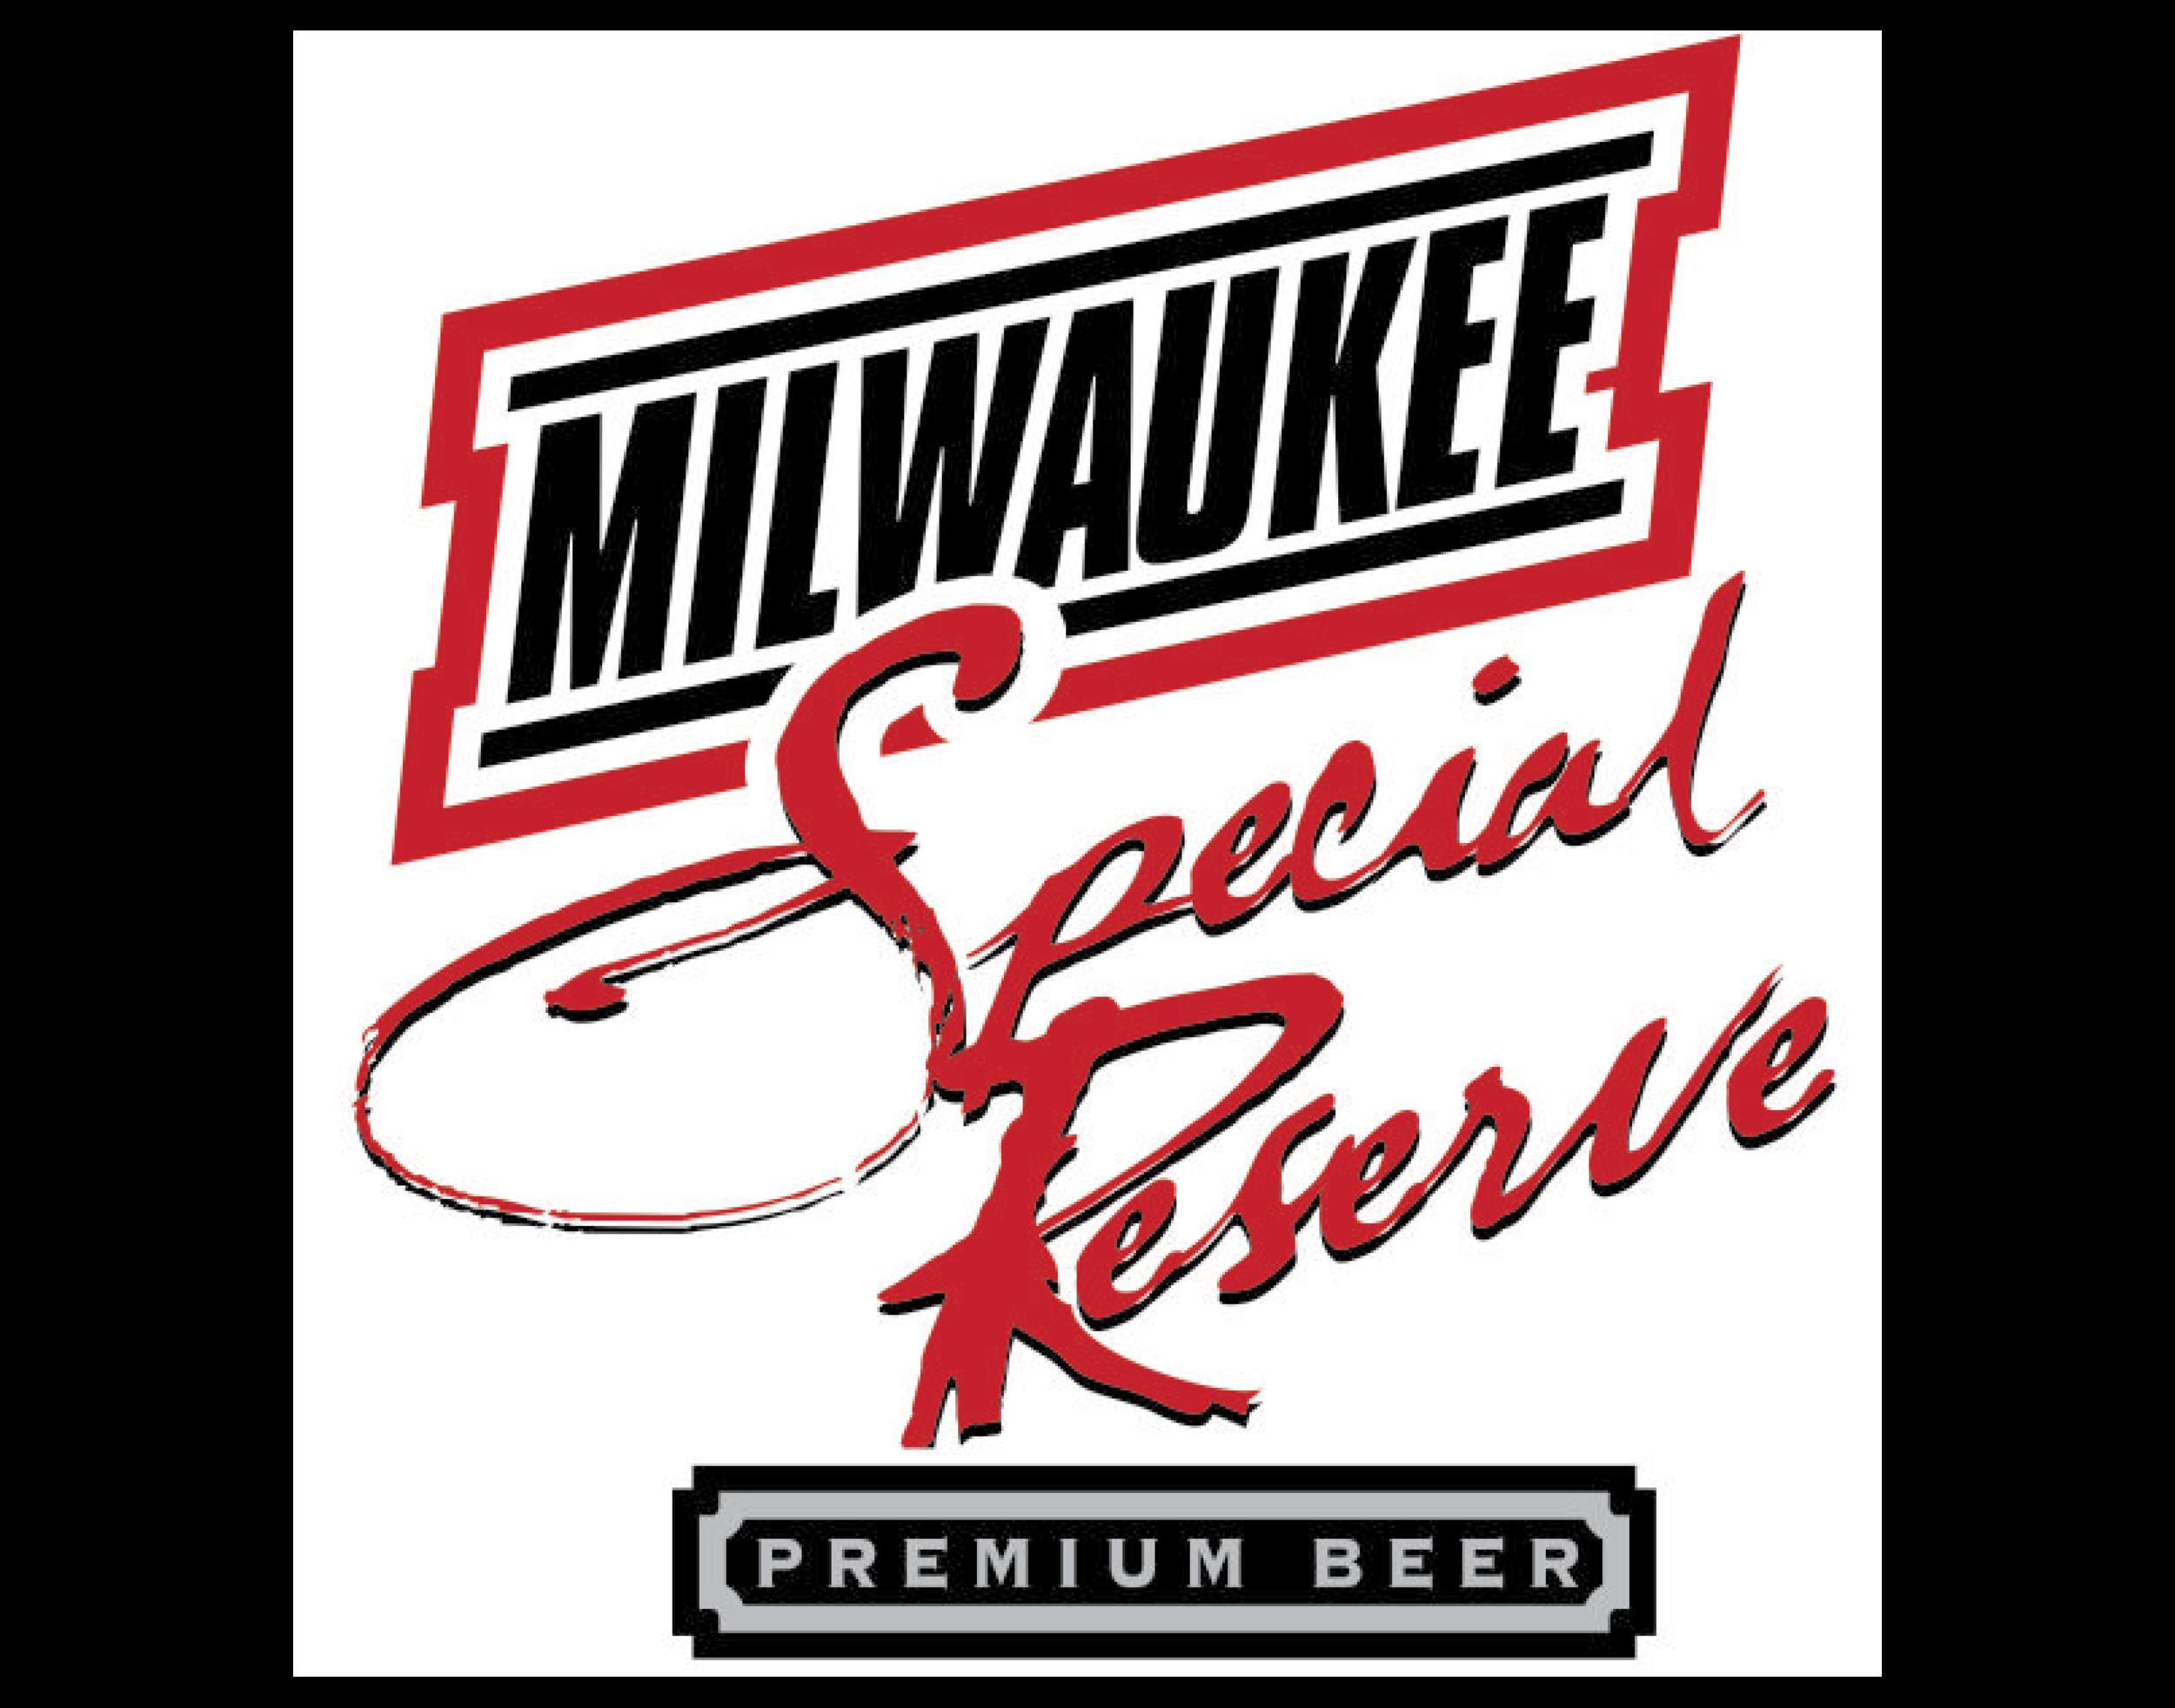 Milwaukee Special Reserve logo. Links to Milwaukee Special Reserve website.